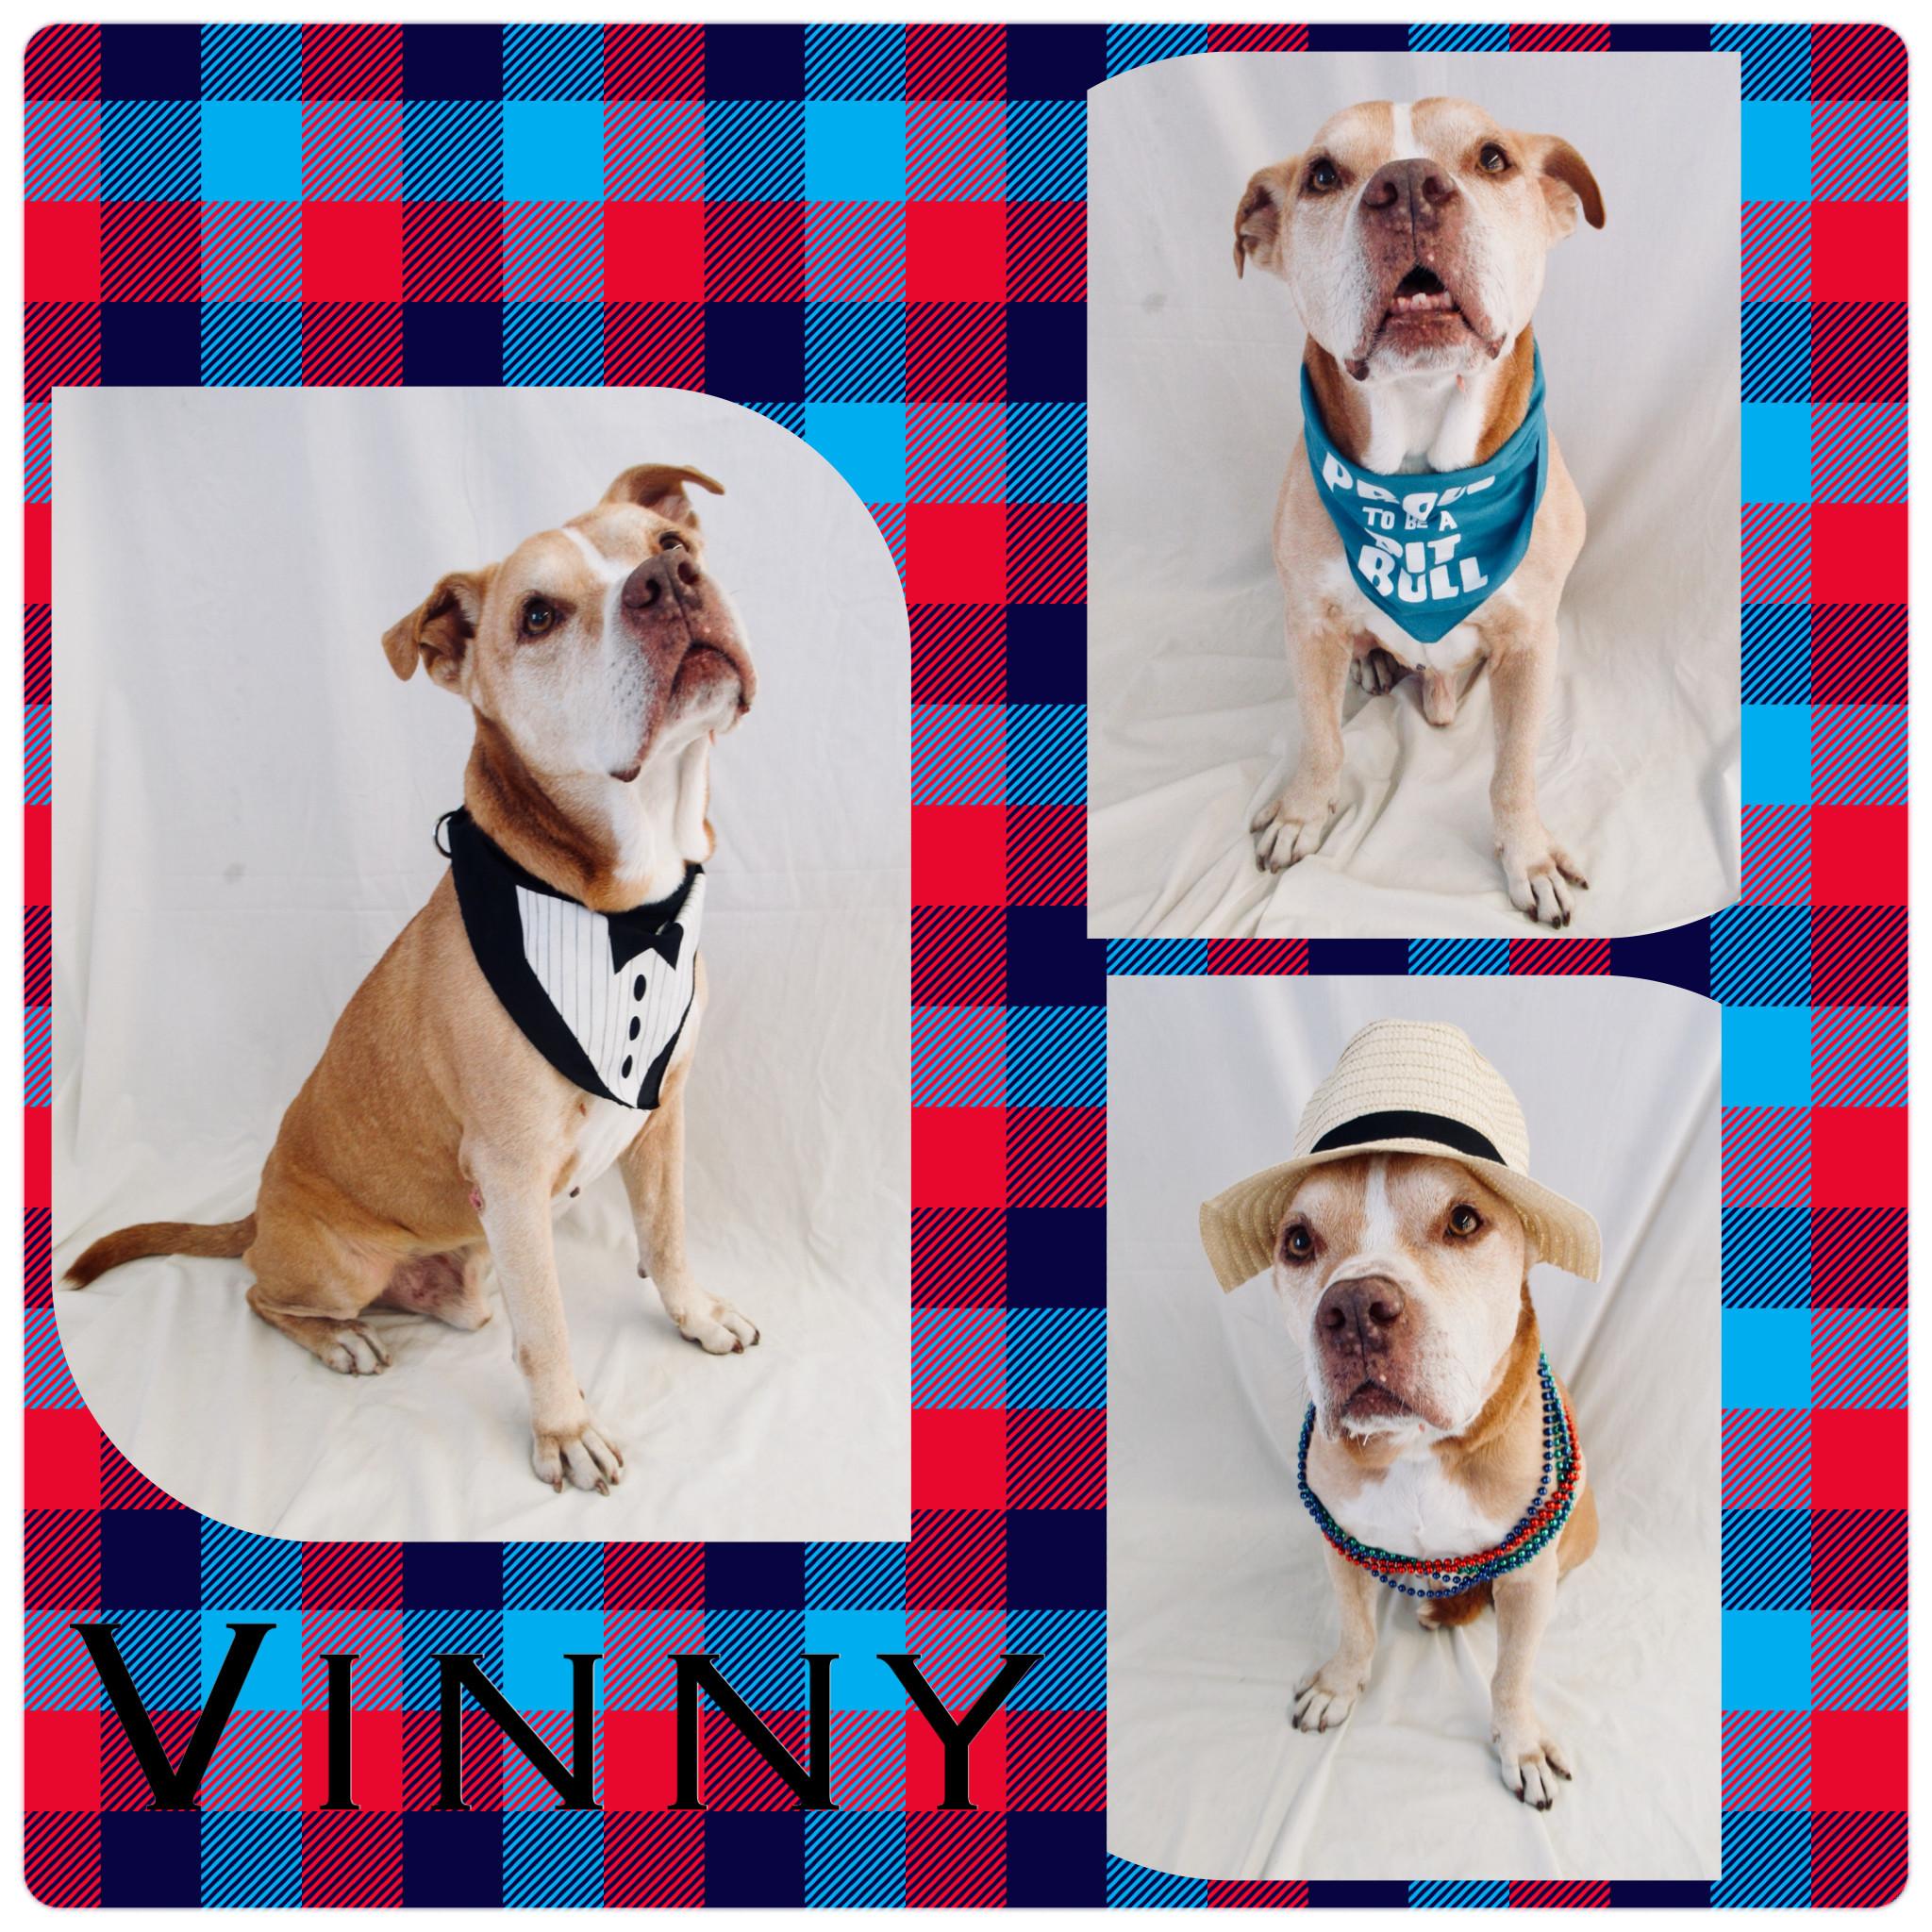 Dog for adoption - Vinny - Pawsitive Direction Program, a